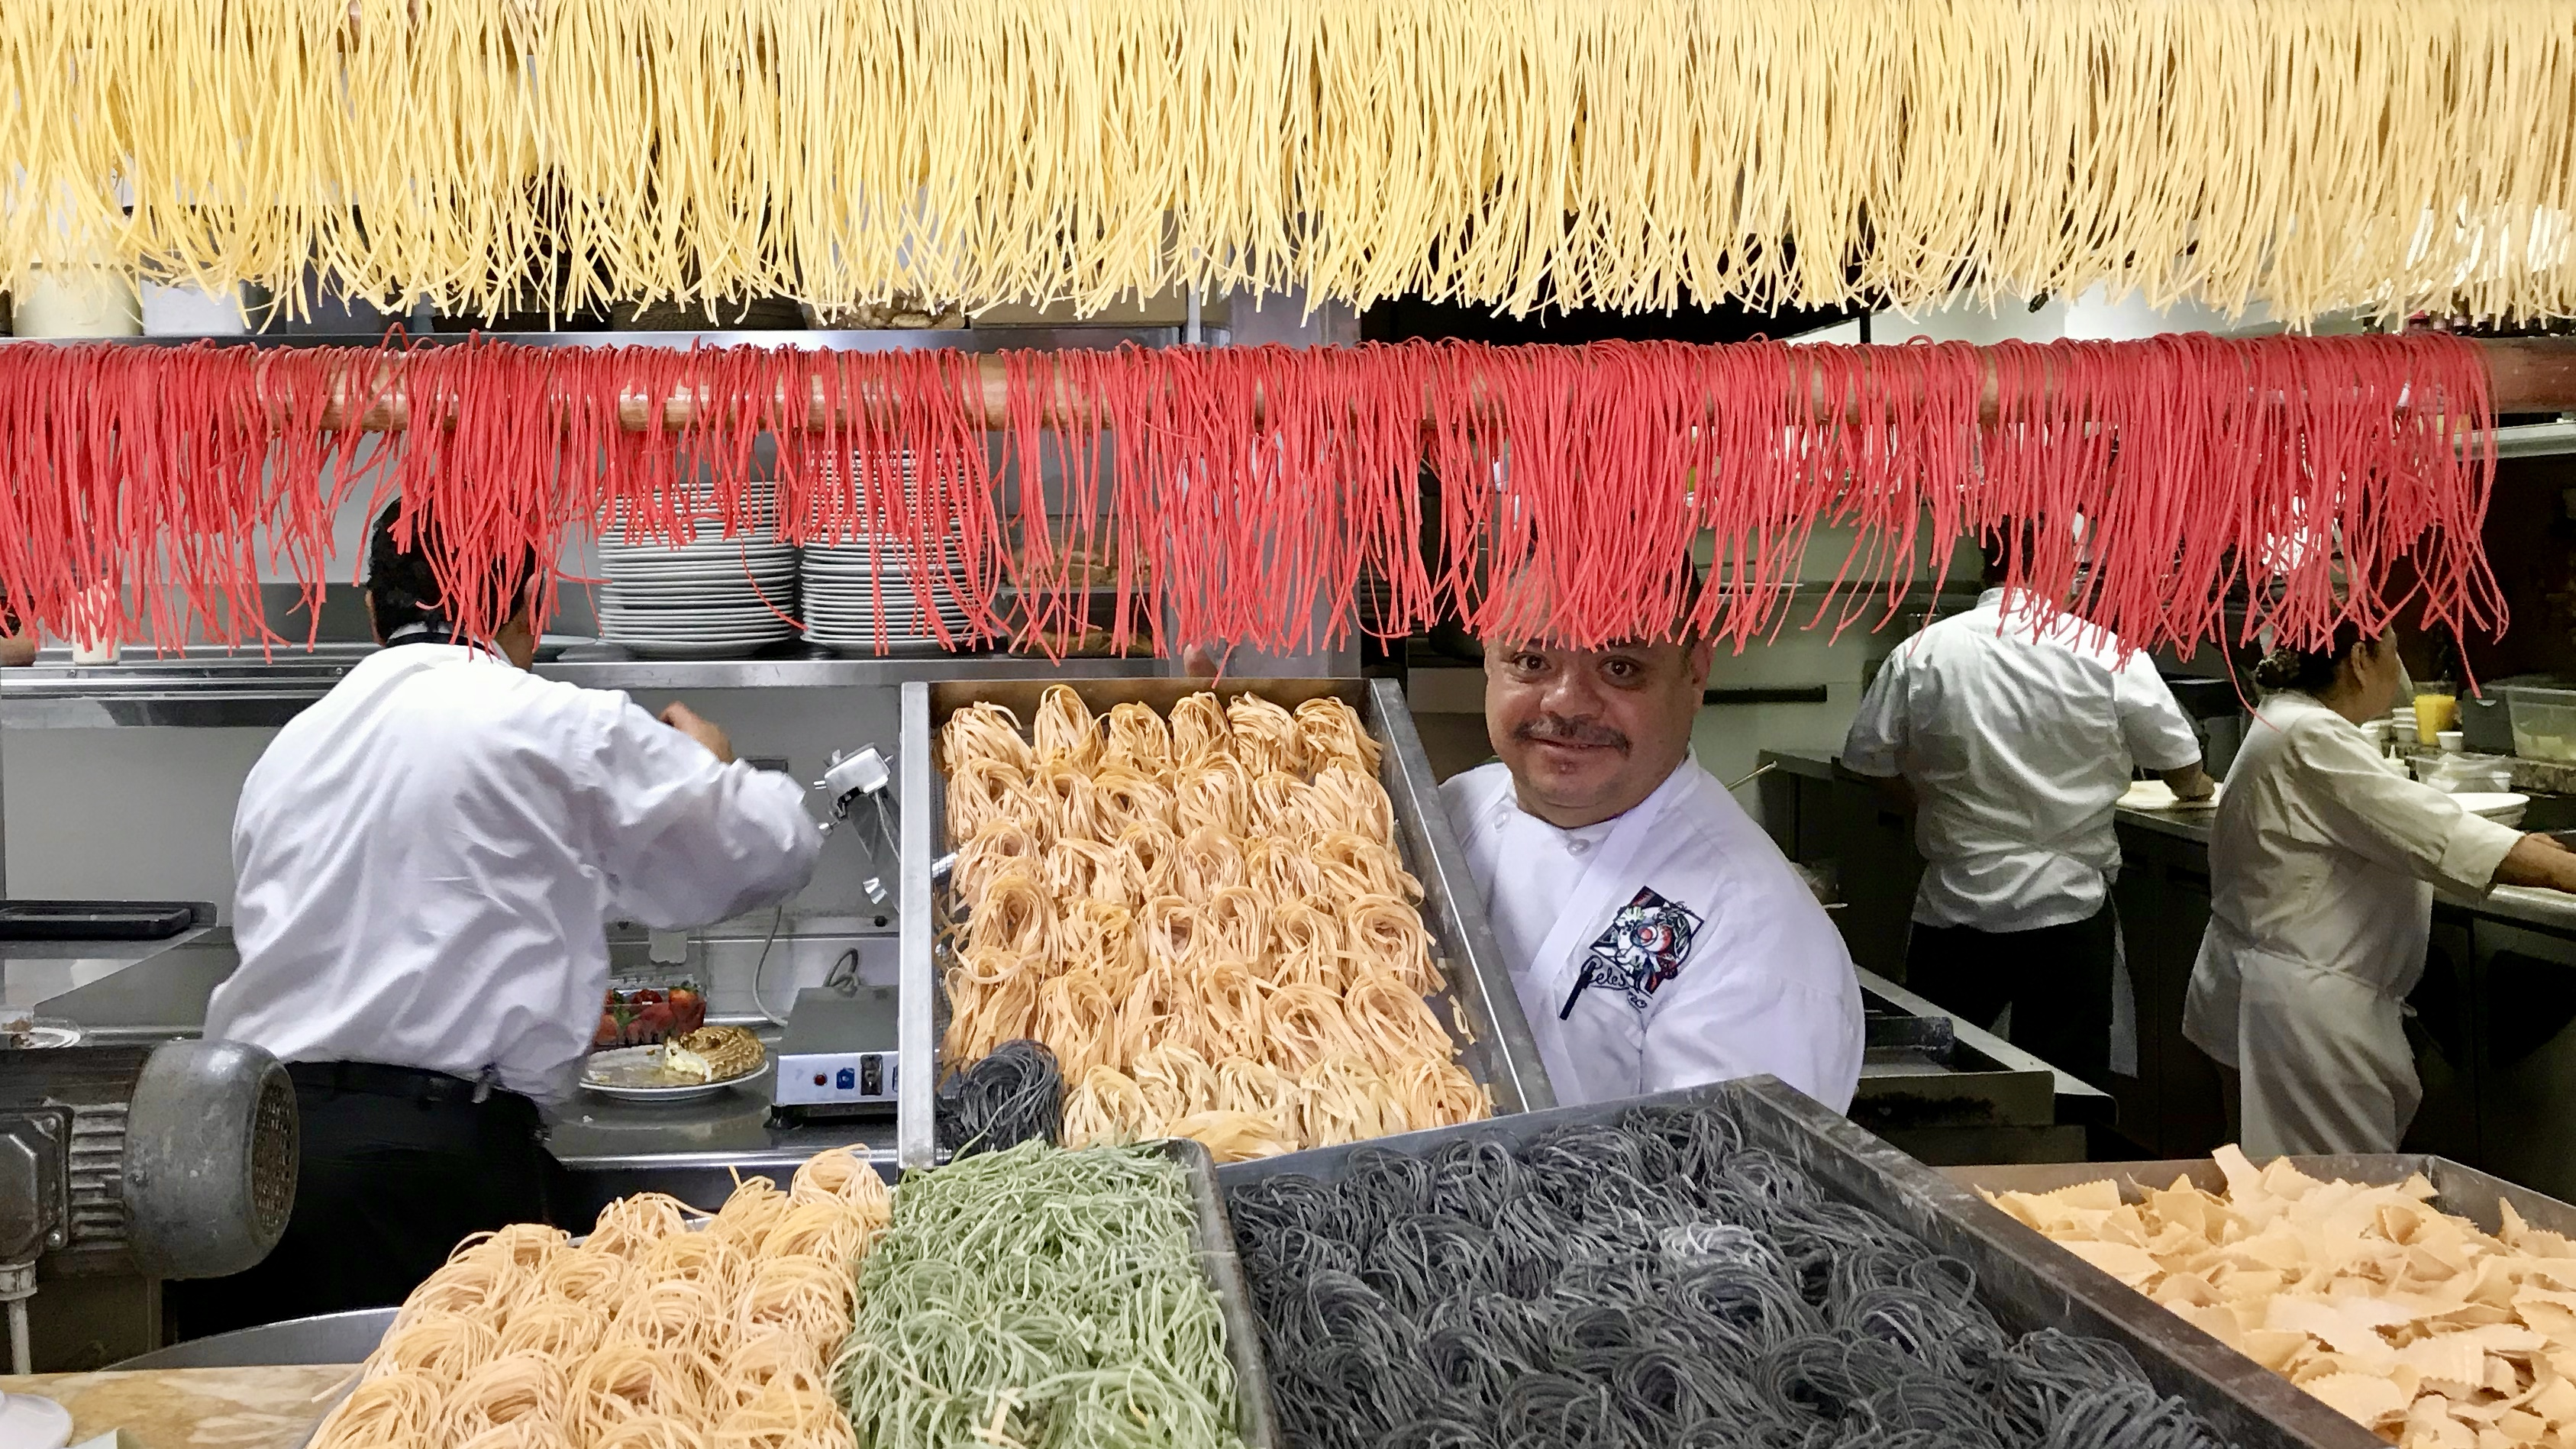 Proud of the Pasta at Celestino in Pasadena